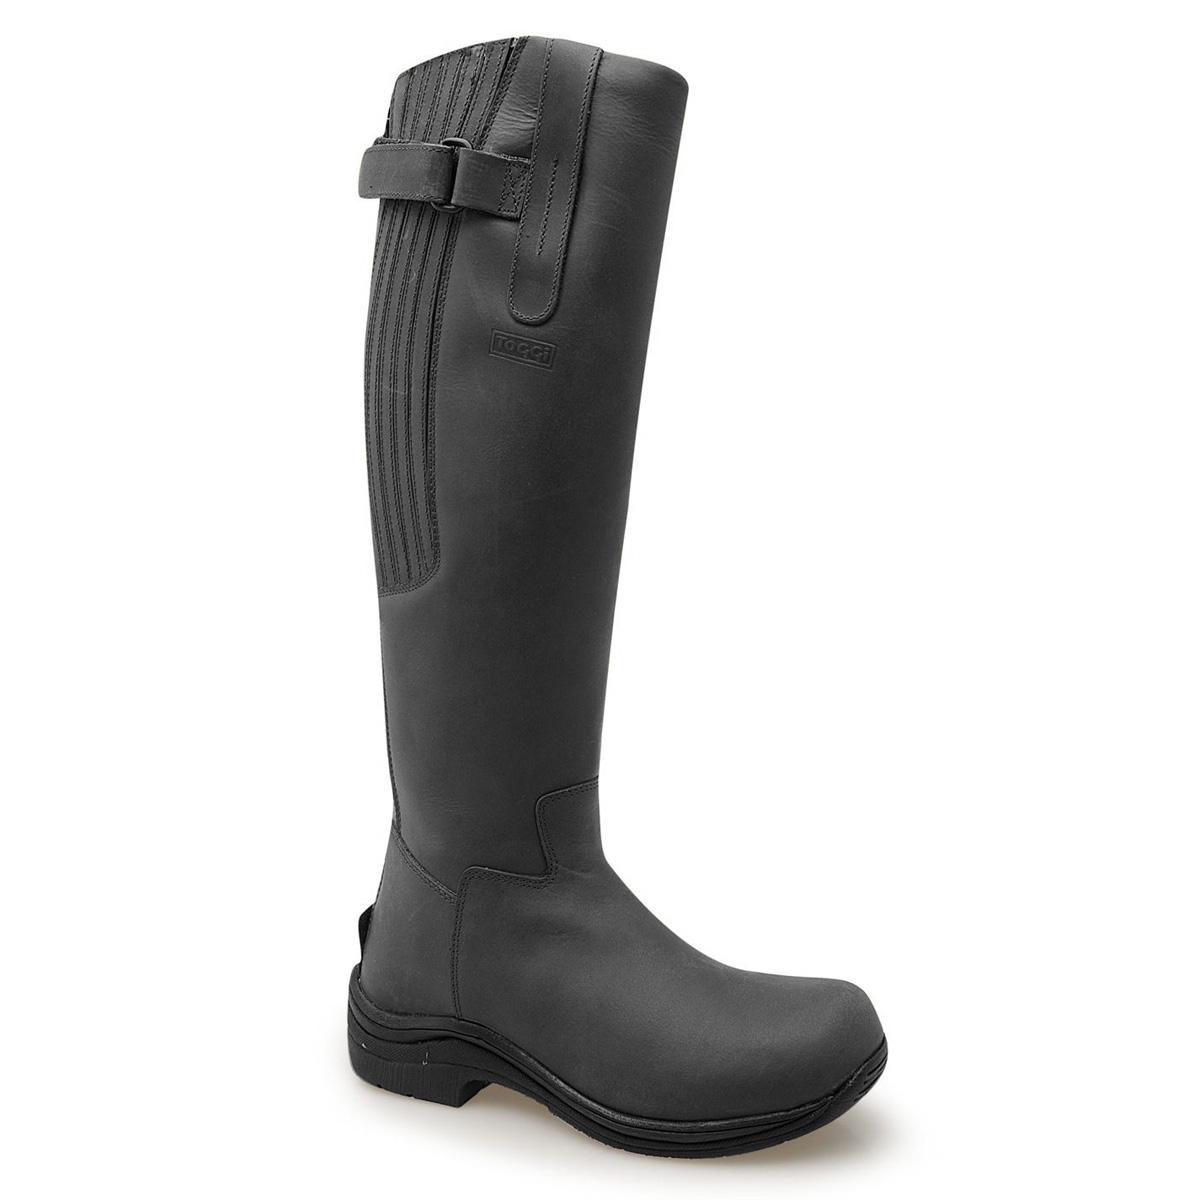 toggi boots image of toggi calgary riding boots